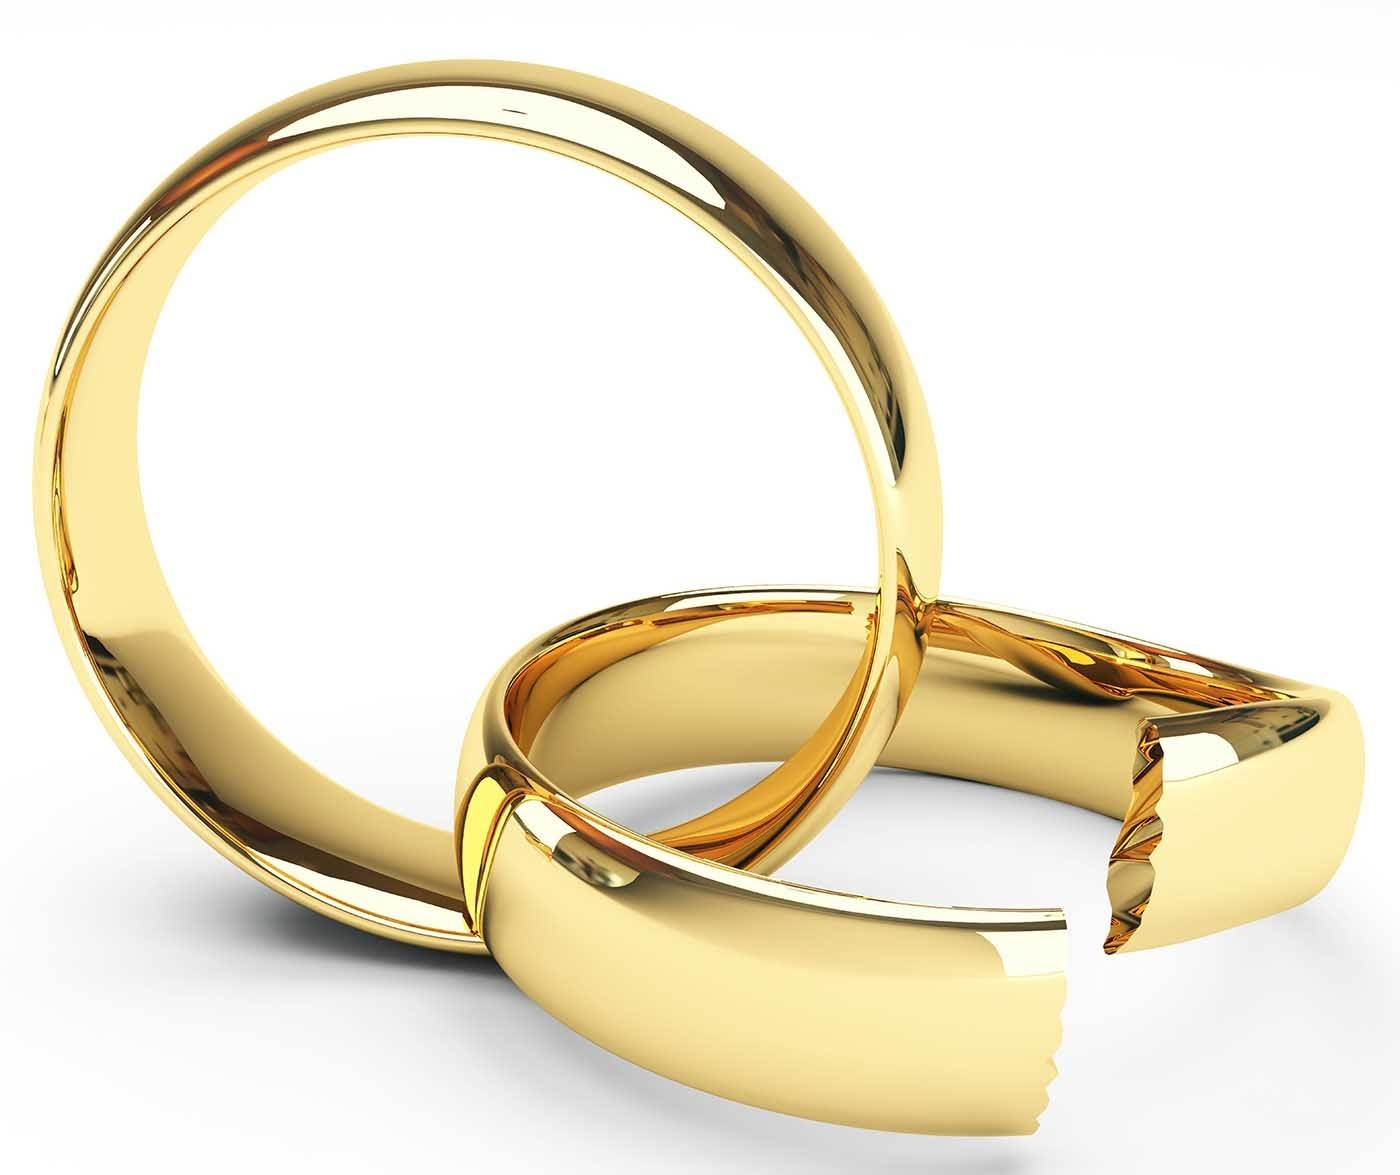 Pro Se Divorce Forms Oklahoma